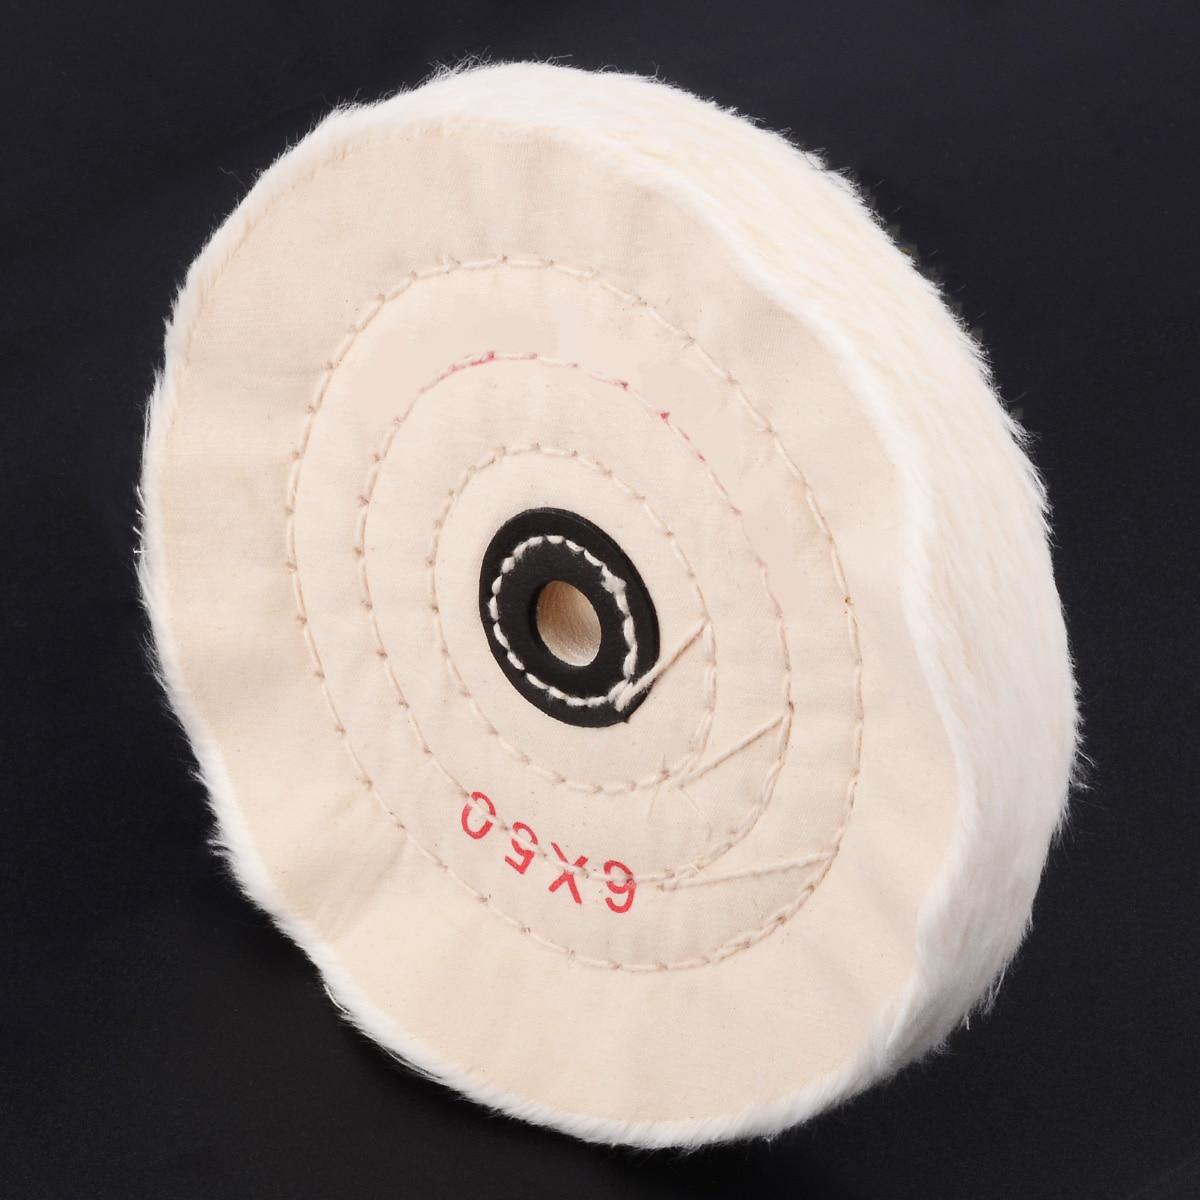 150mm White Flannel Polishing Pad Wheel Useful 6 Inch Buffing Polishing Wheel Disc Metal Marble Glass Ceramics Grinding Felt